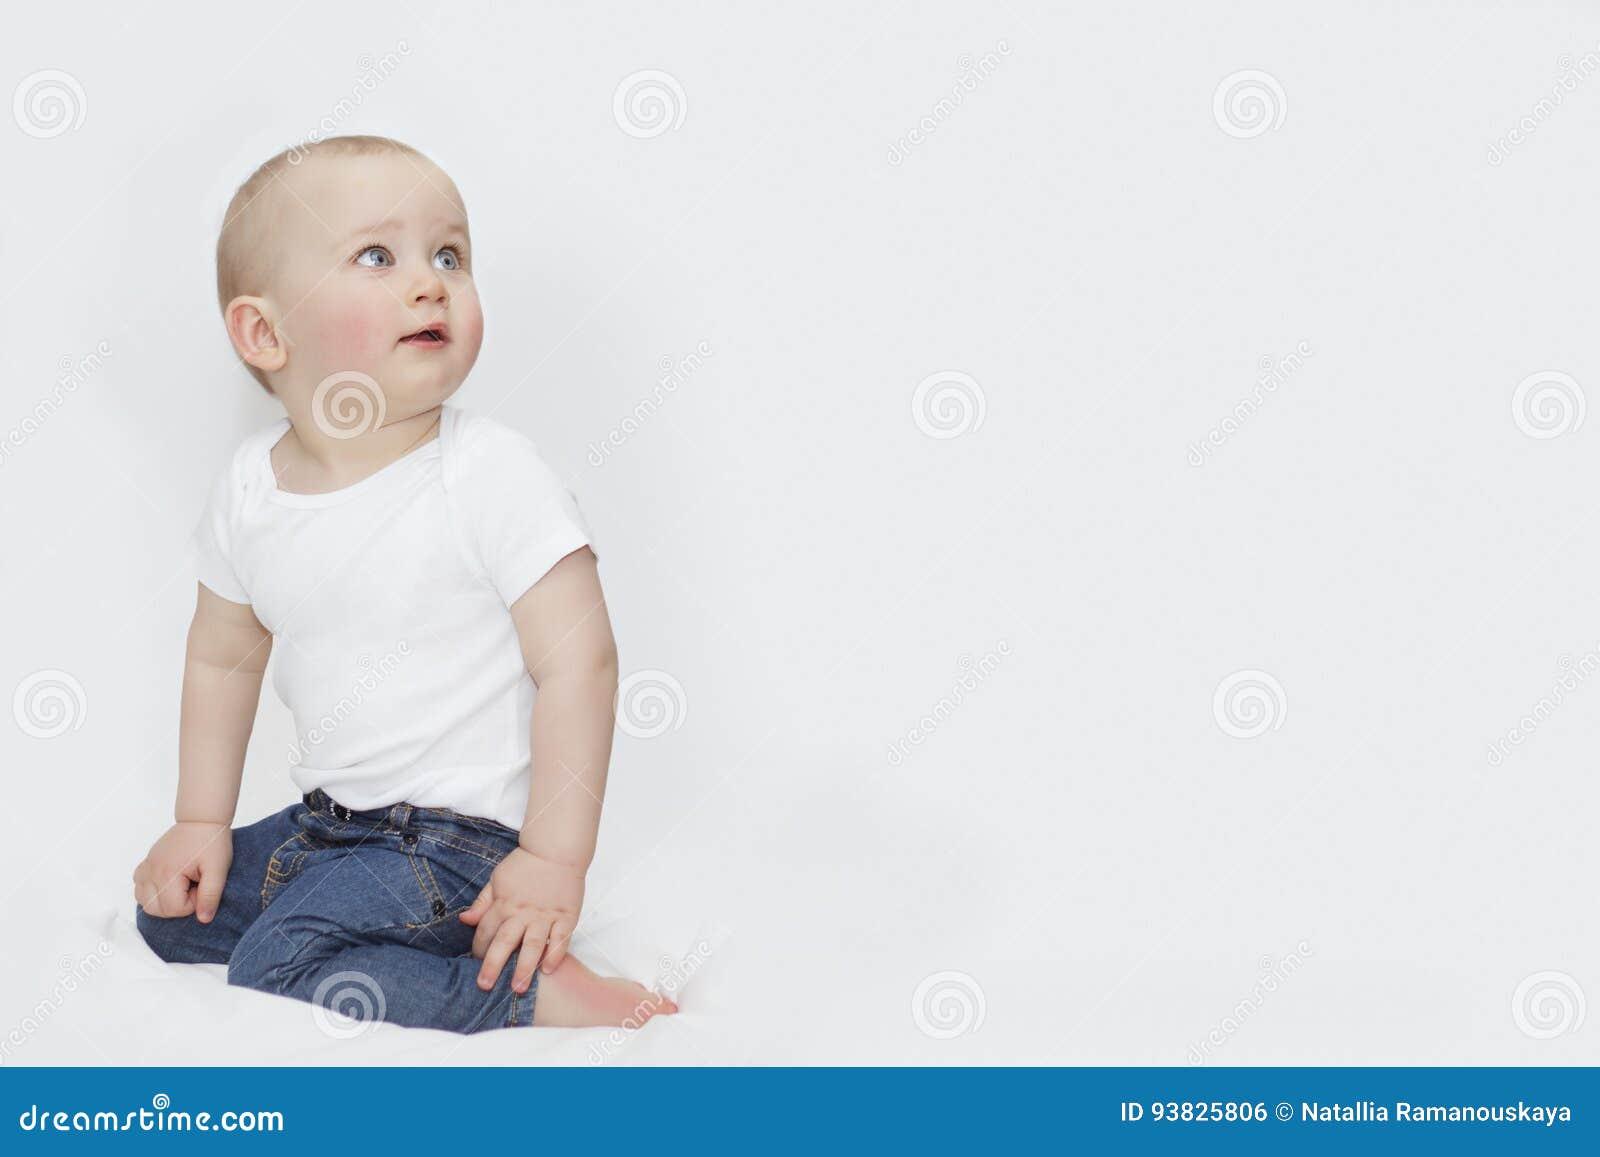 1b1cd80e91b A Boy With Blue Eyes In Jeans On A White Background Stock Photo ...